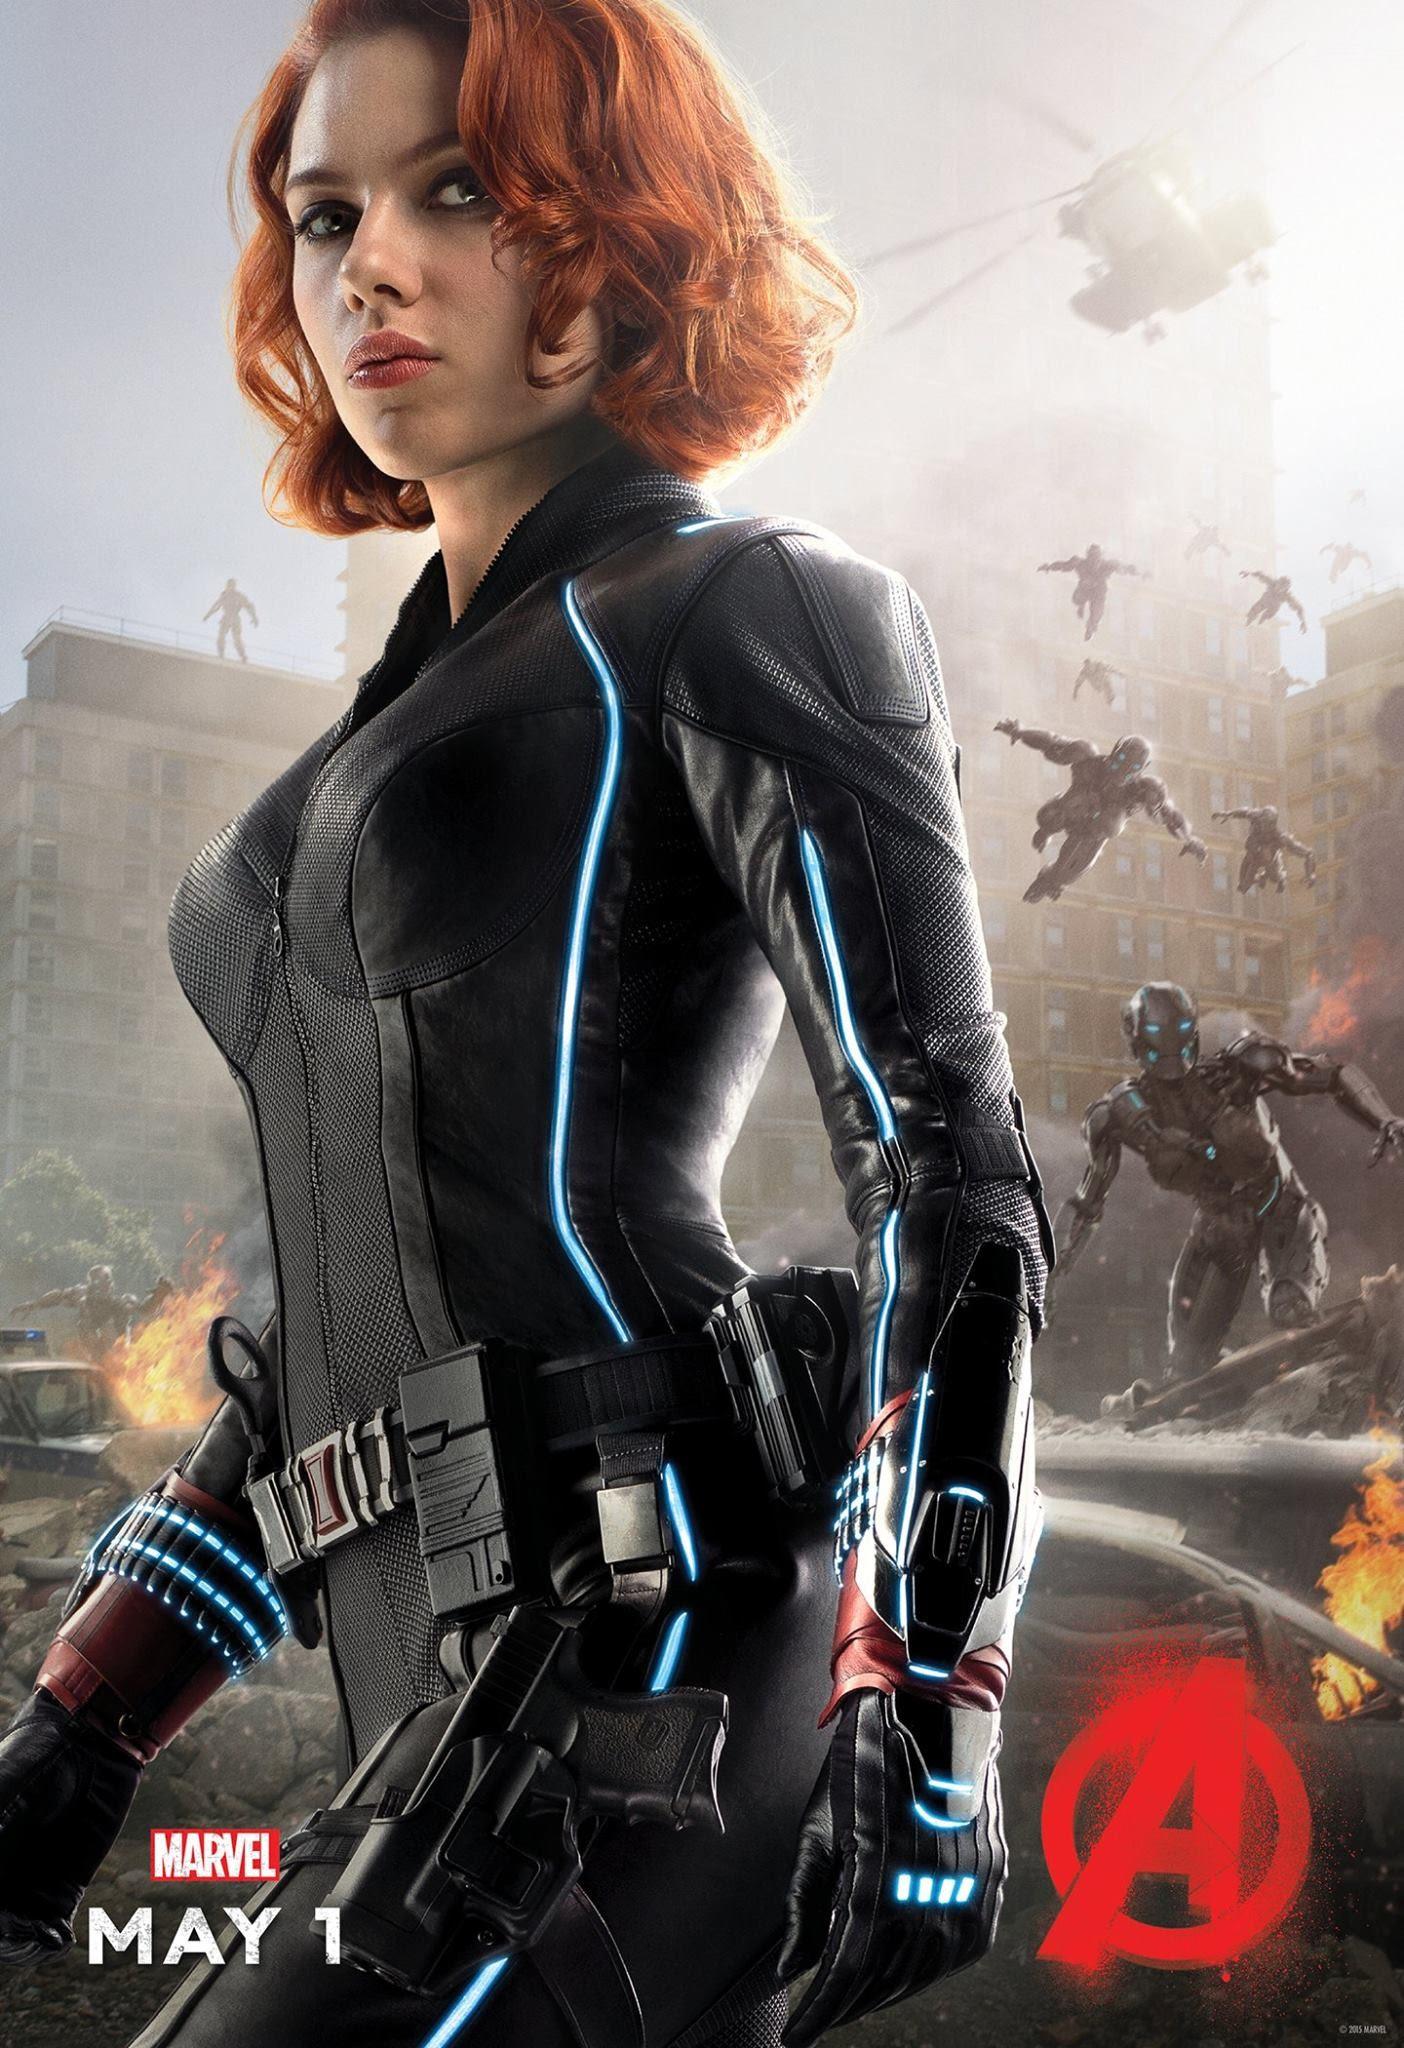 Black Widow Wallpapers Scarlett Johansson 76 Images